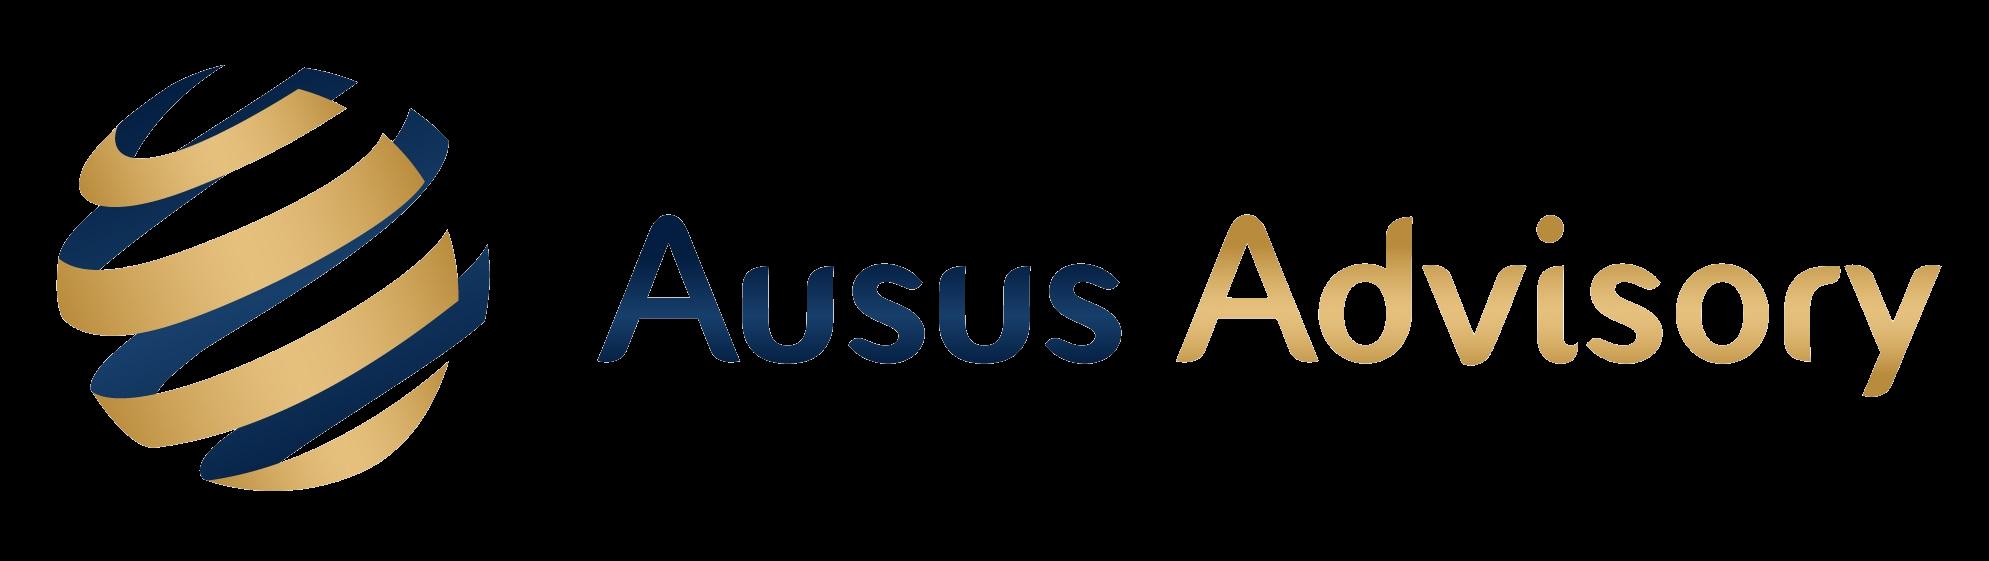 AususAdvisory T (1989 x 561).png